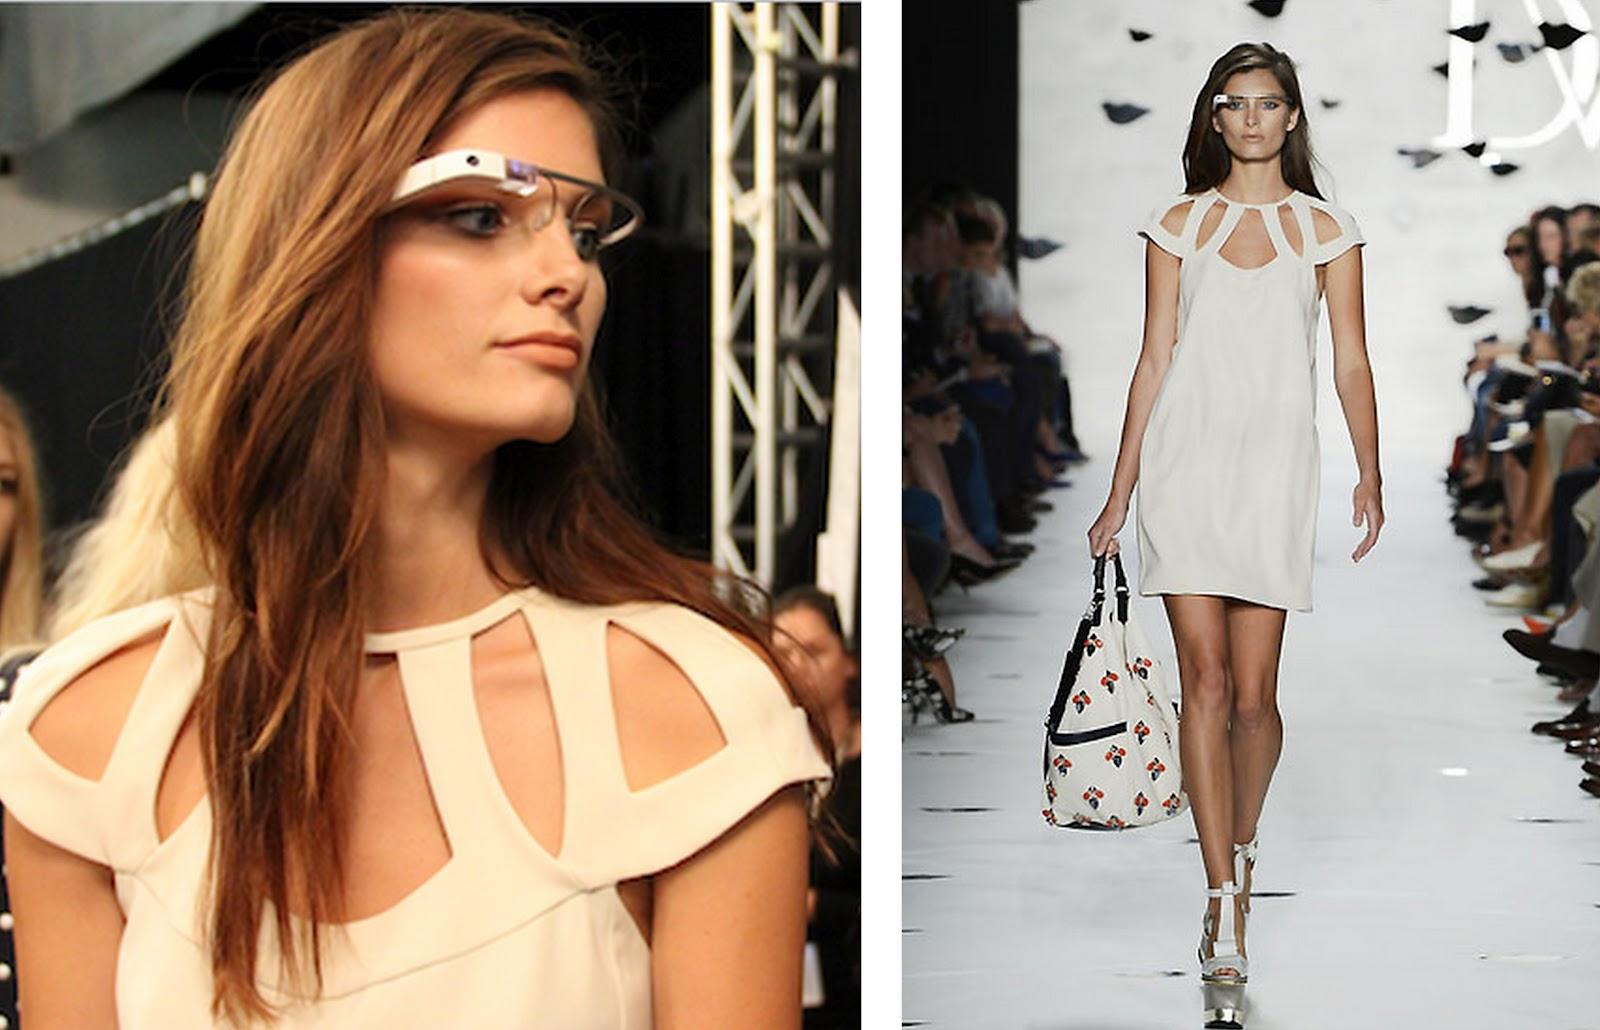 Trend Google Glass For Fashion Accessory